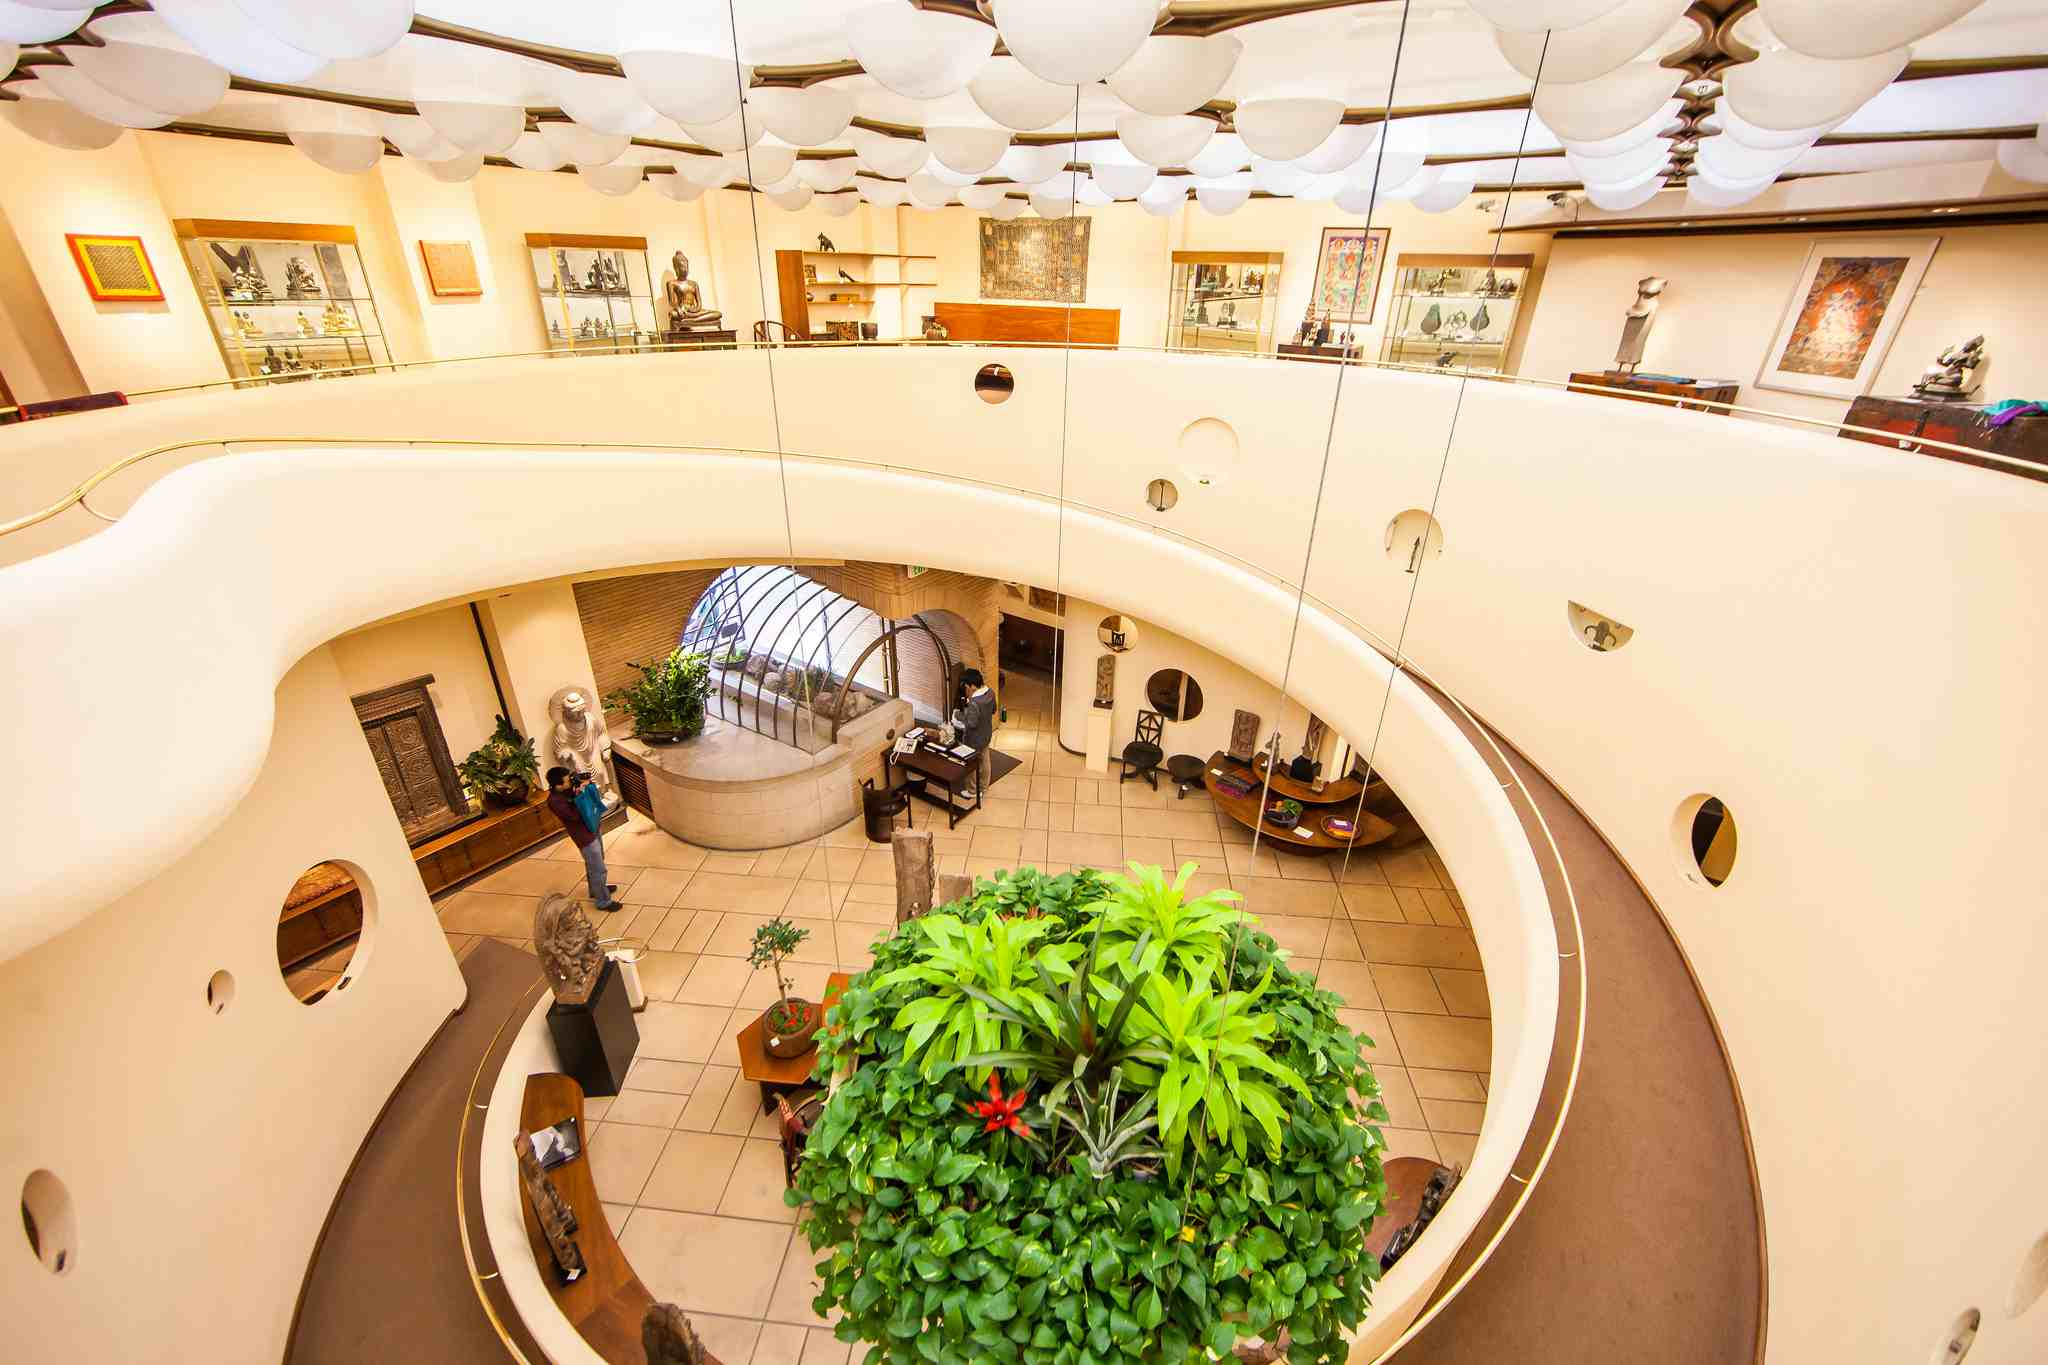 Interior, V.C. Morris Gift Shop/Xanadu Gallery